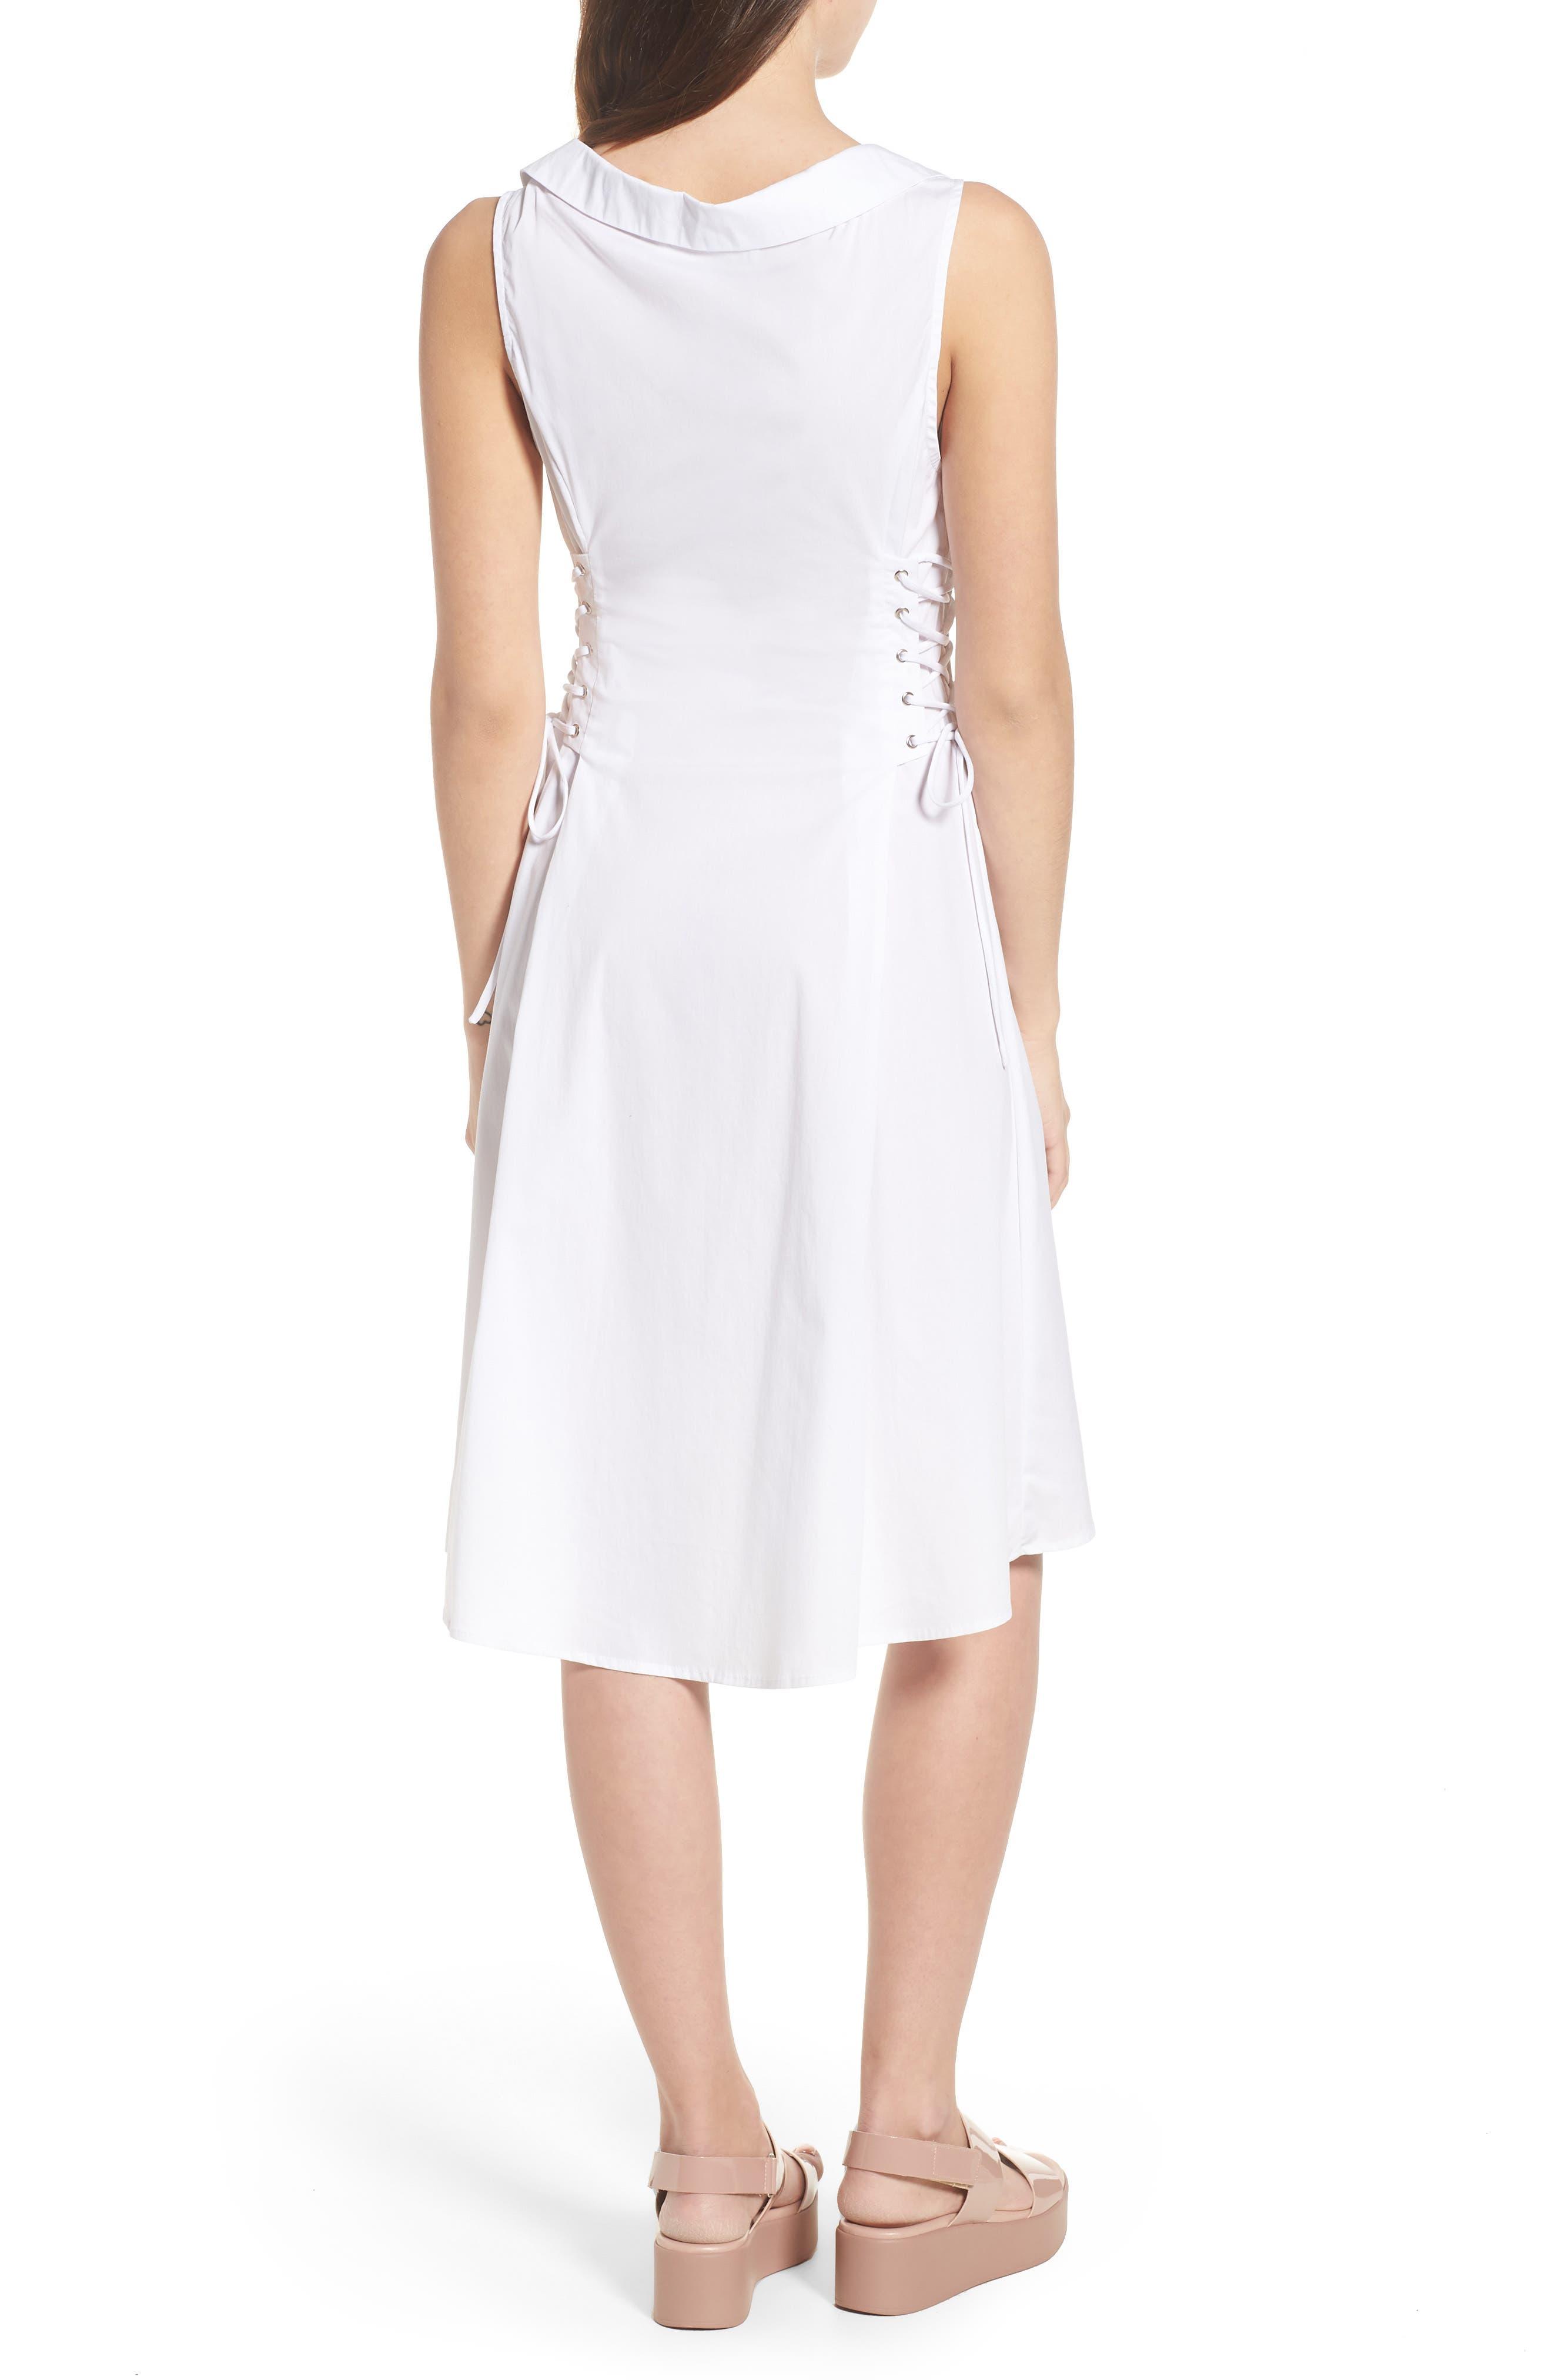 Sydney Lace Side Dress,                             Alternate thumbnail 2, color,